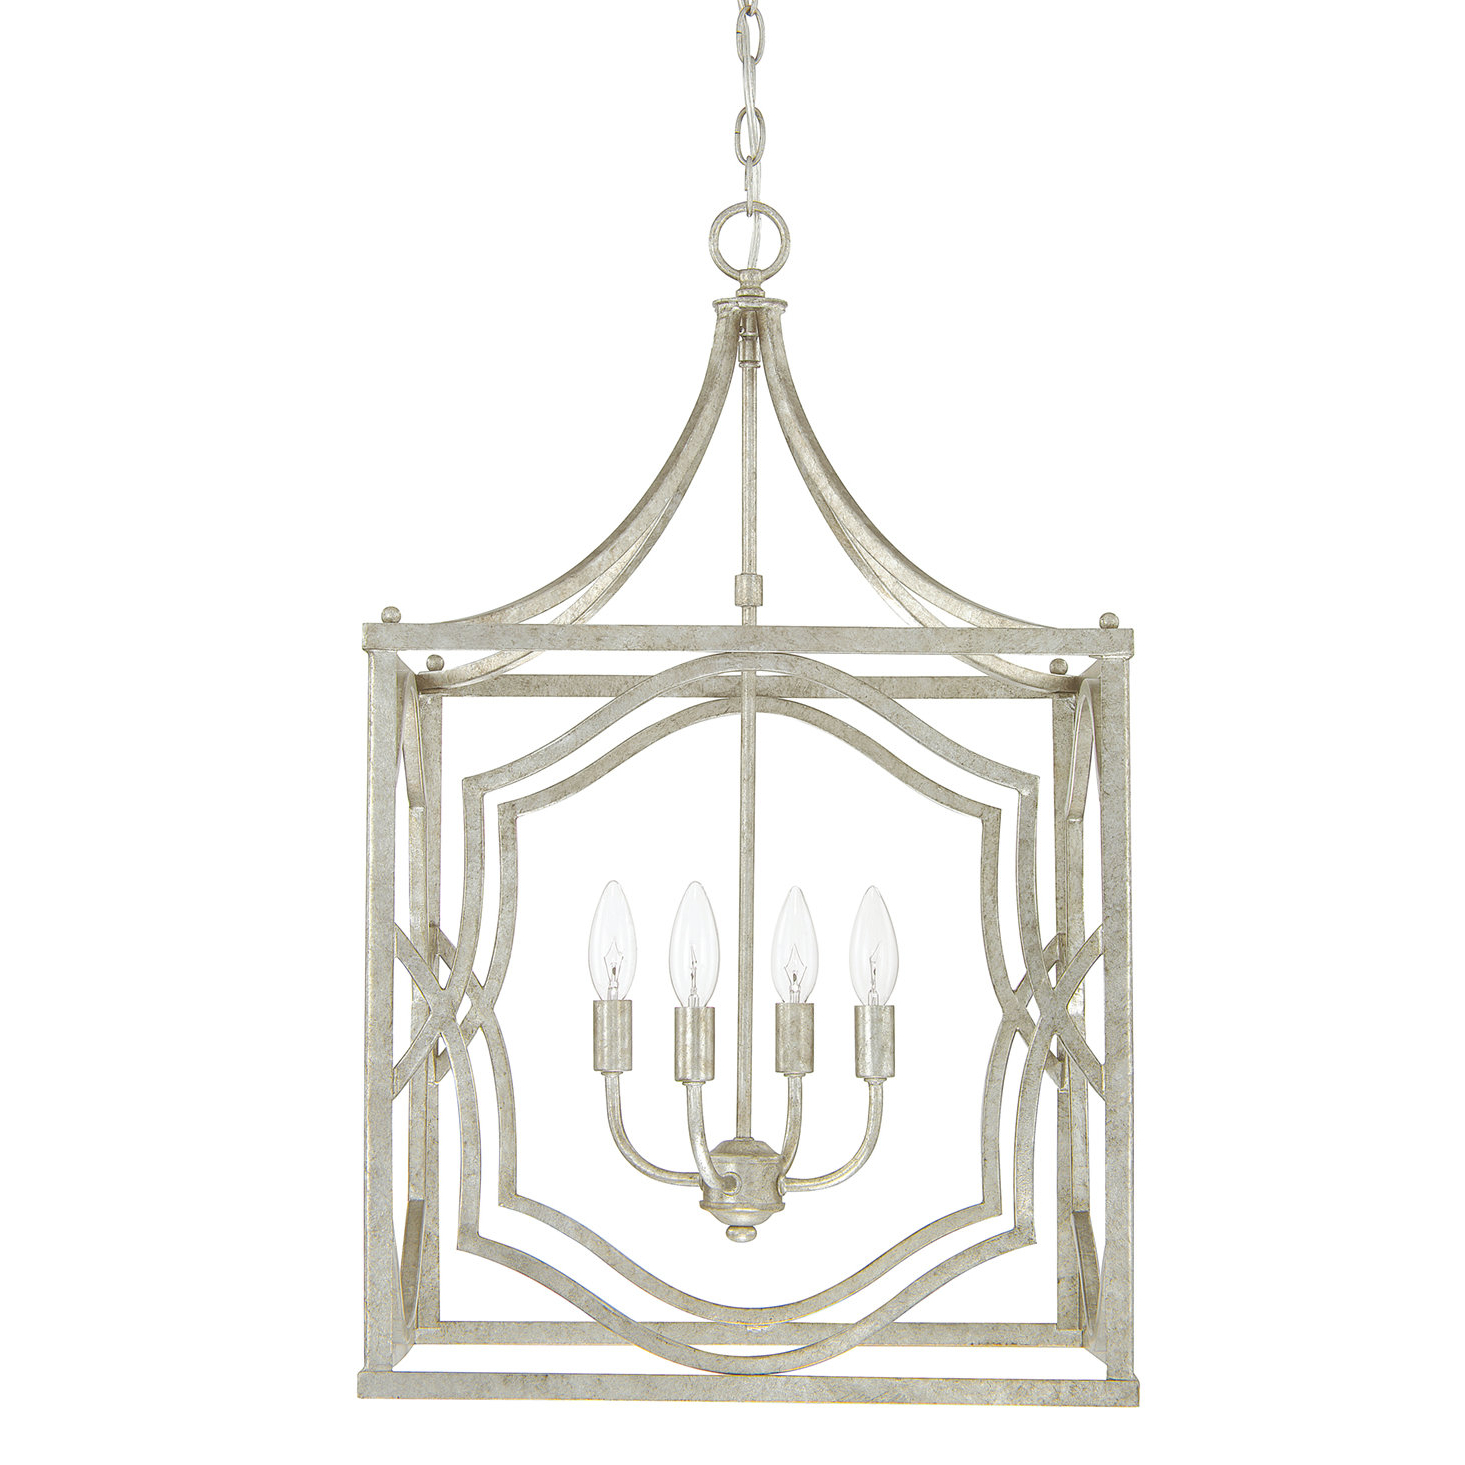 Latest Destrey 4 Light Lantern Square / Rectangle Pendant Regarding Freeburg 4 Light Lantern Square / Rectangle Pendants (View 5 of 20)